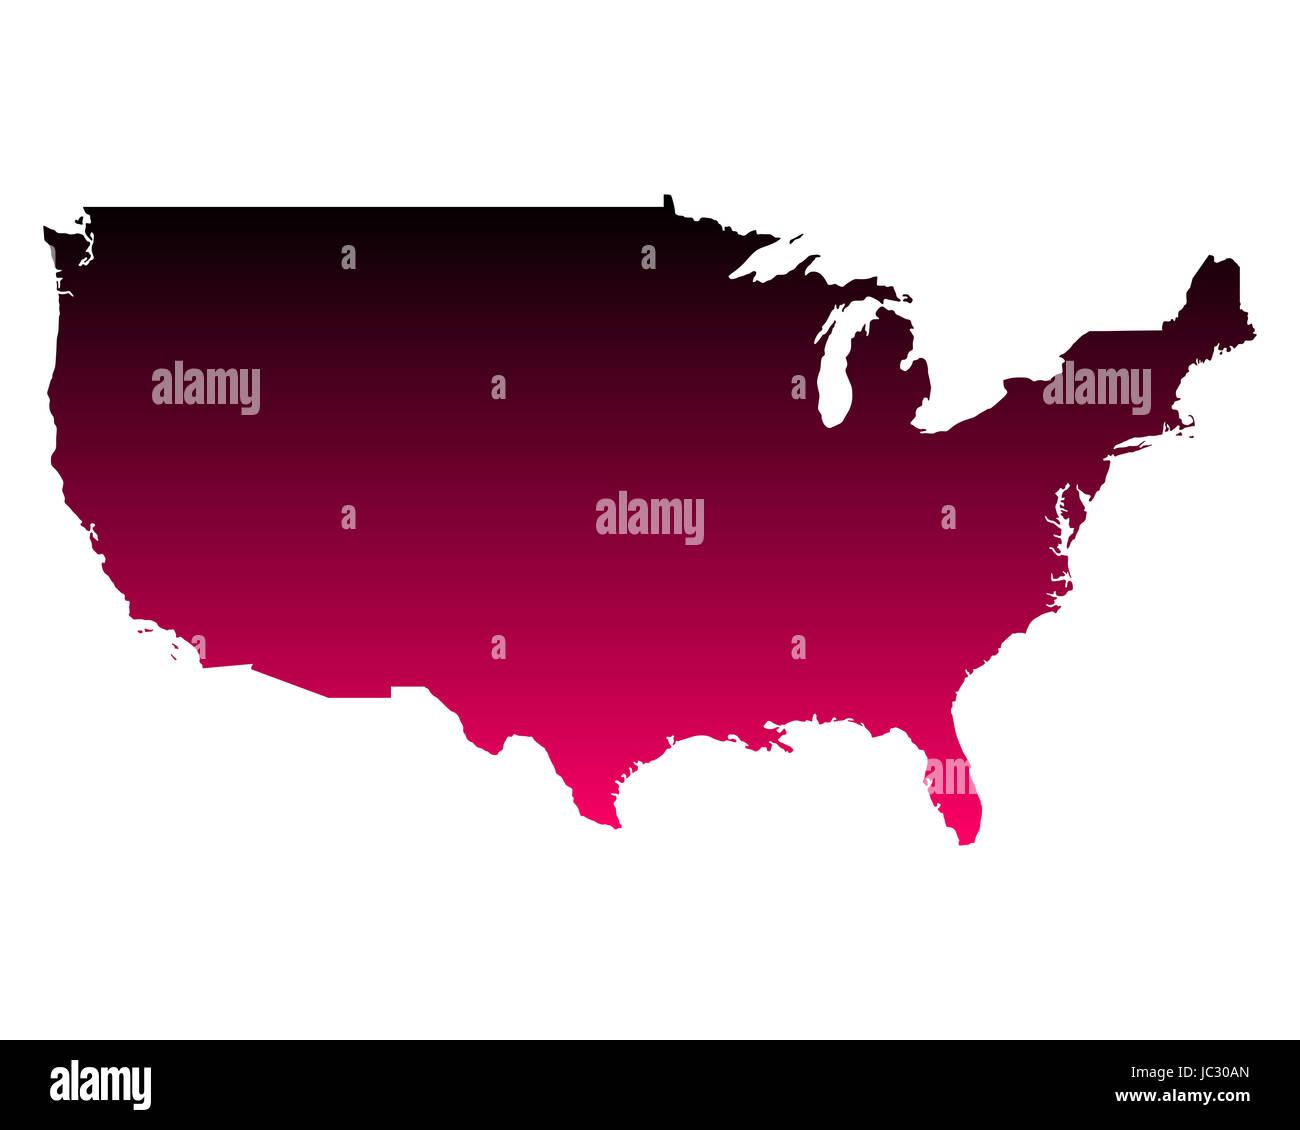 Karte der USA - Stock Image